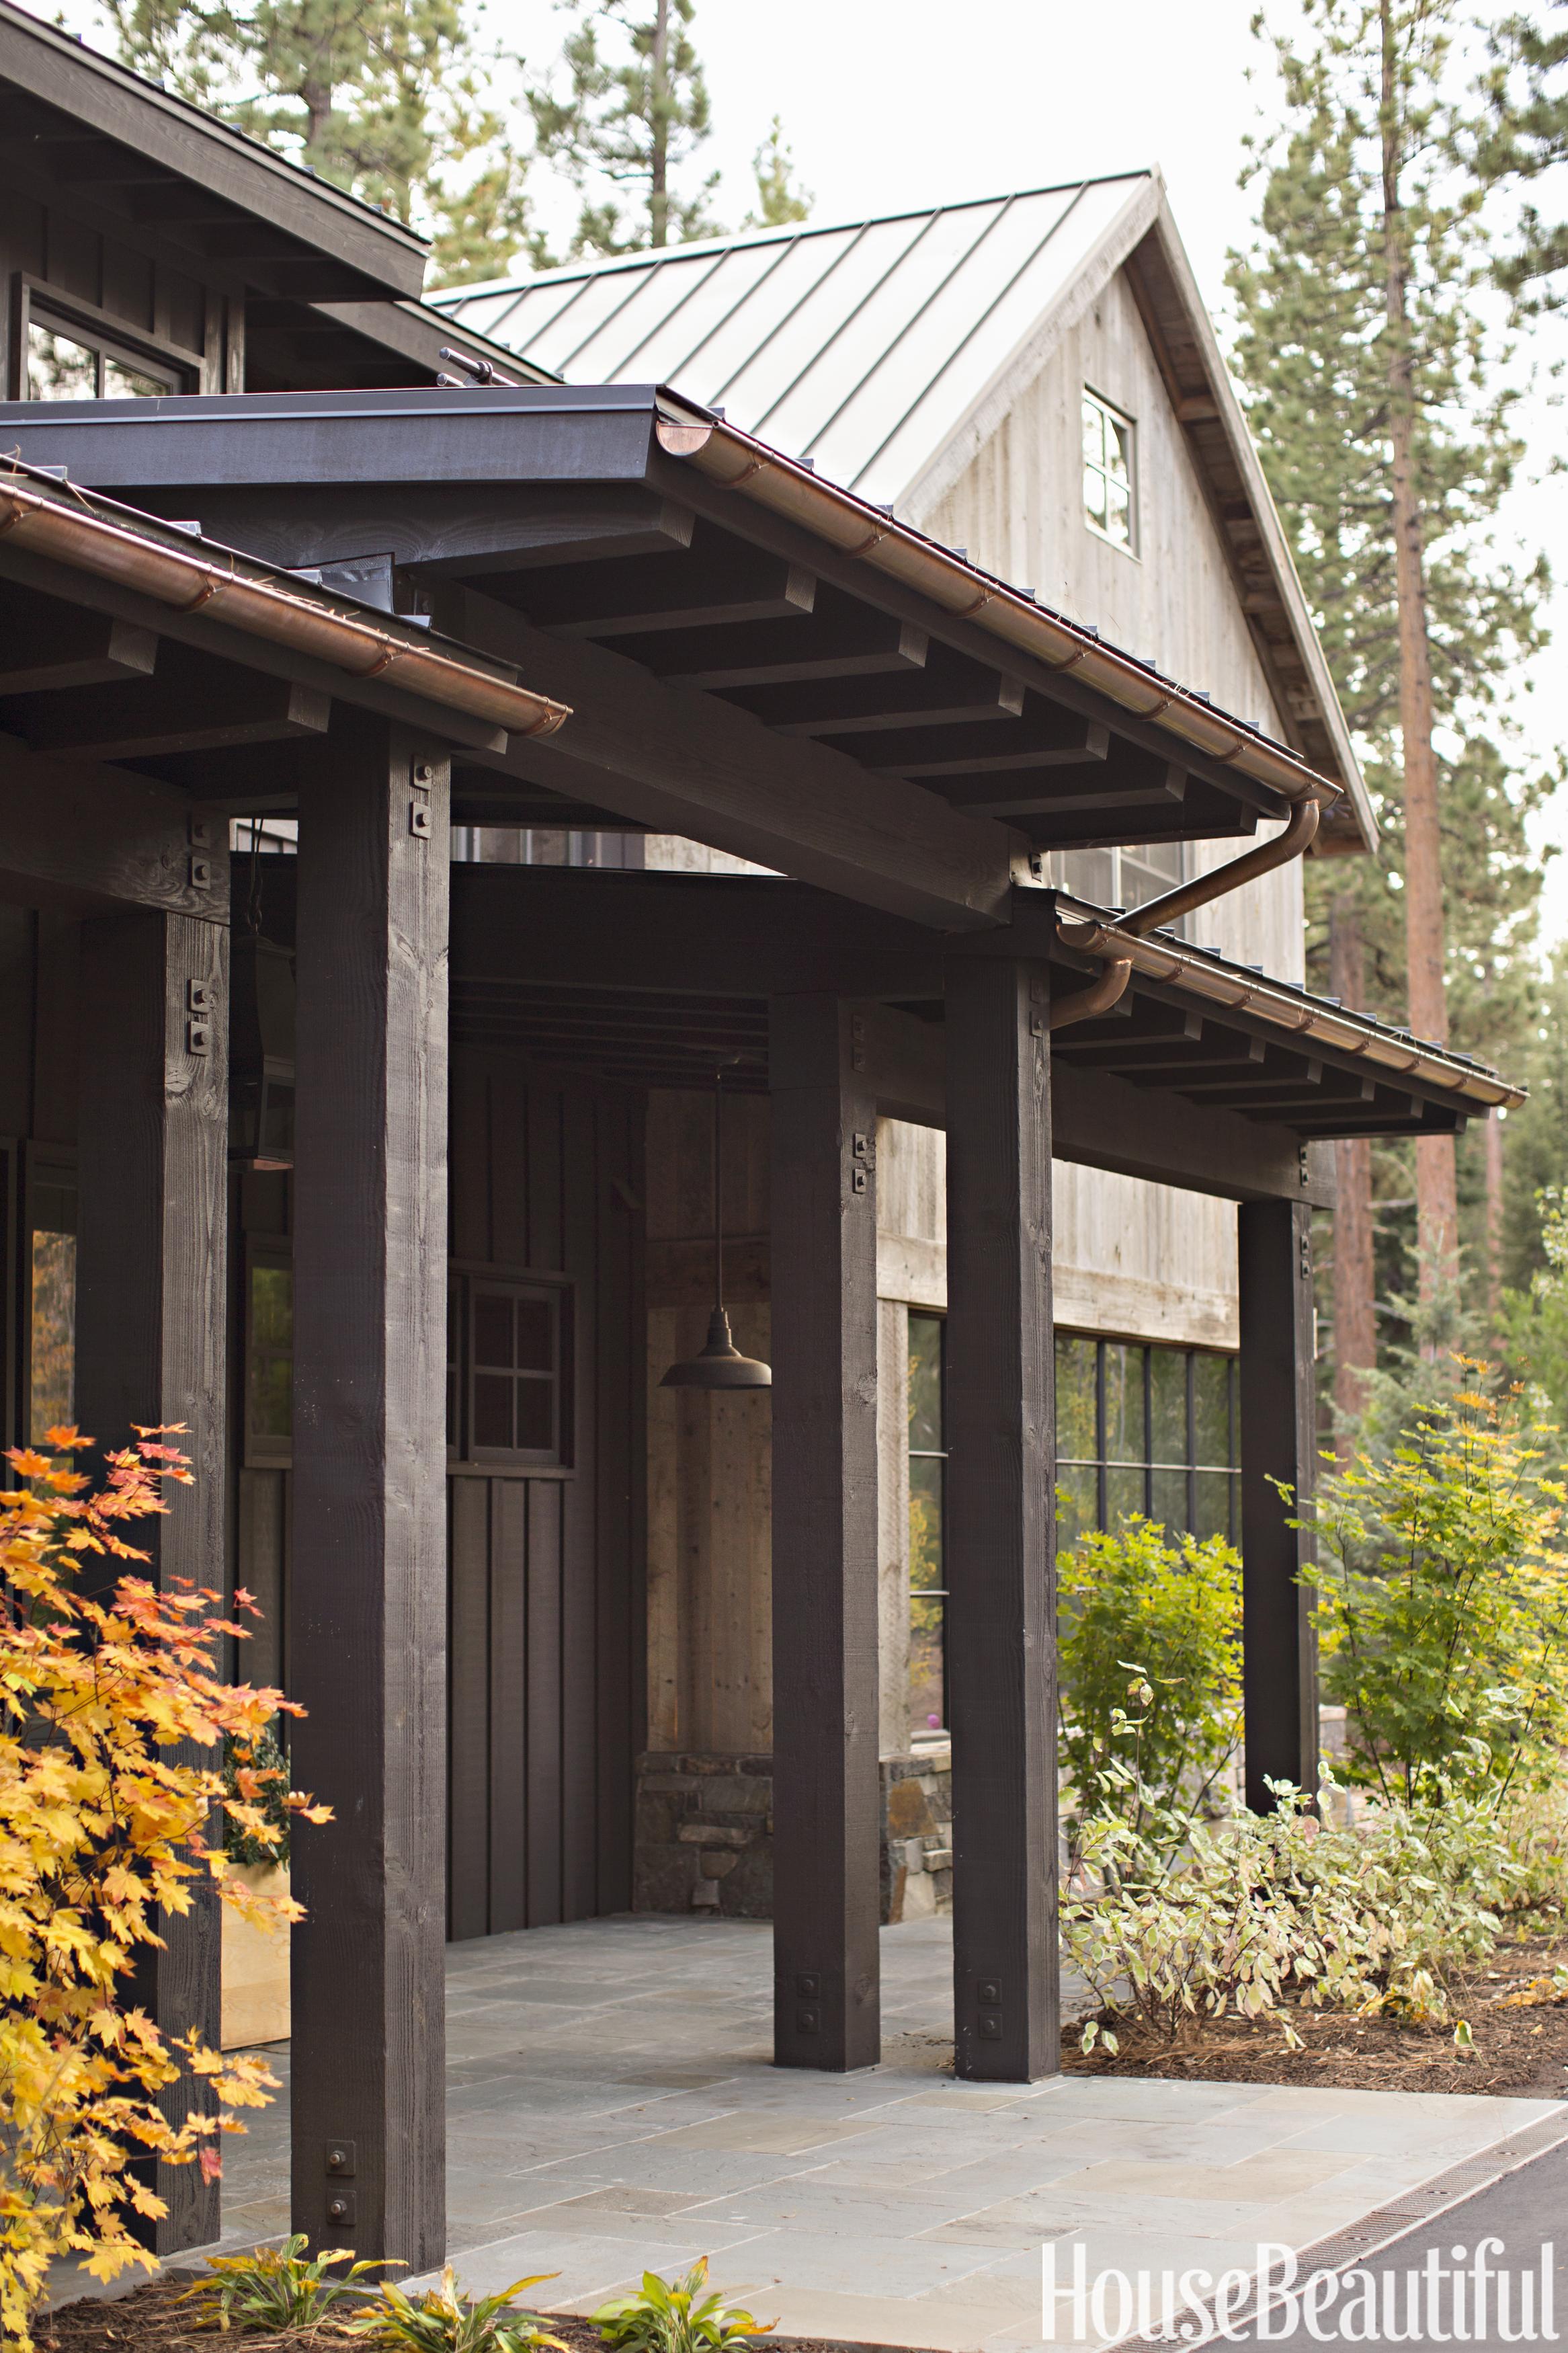 The Best Exterior House Design Ideas: 36 House Exterior Design Ideas